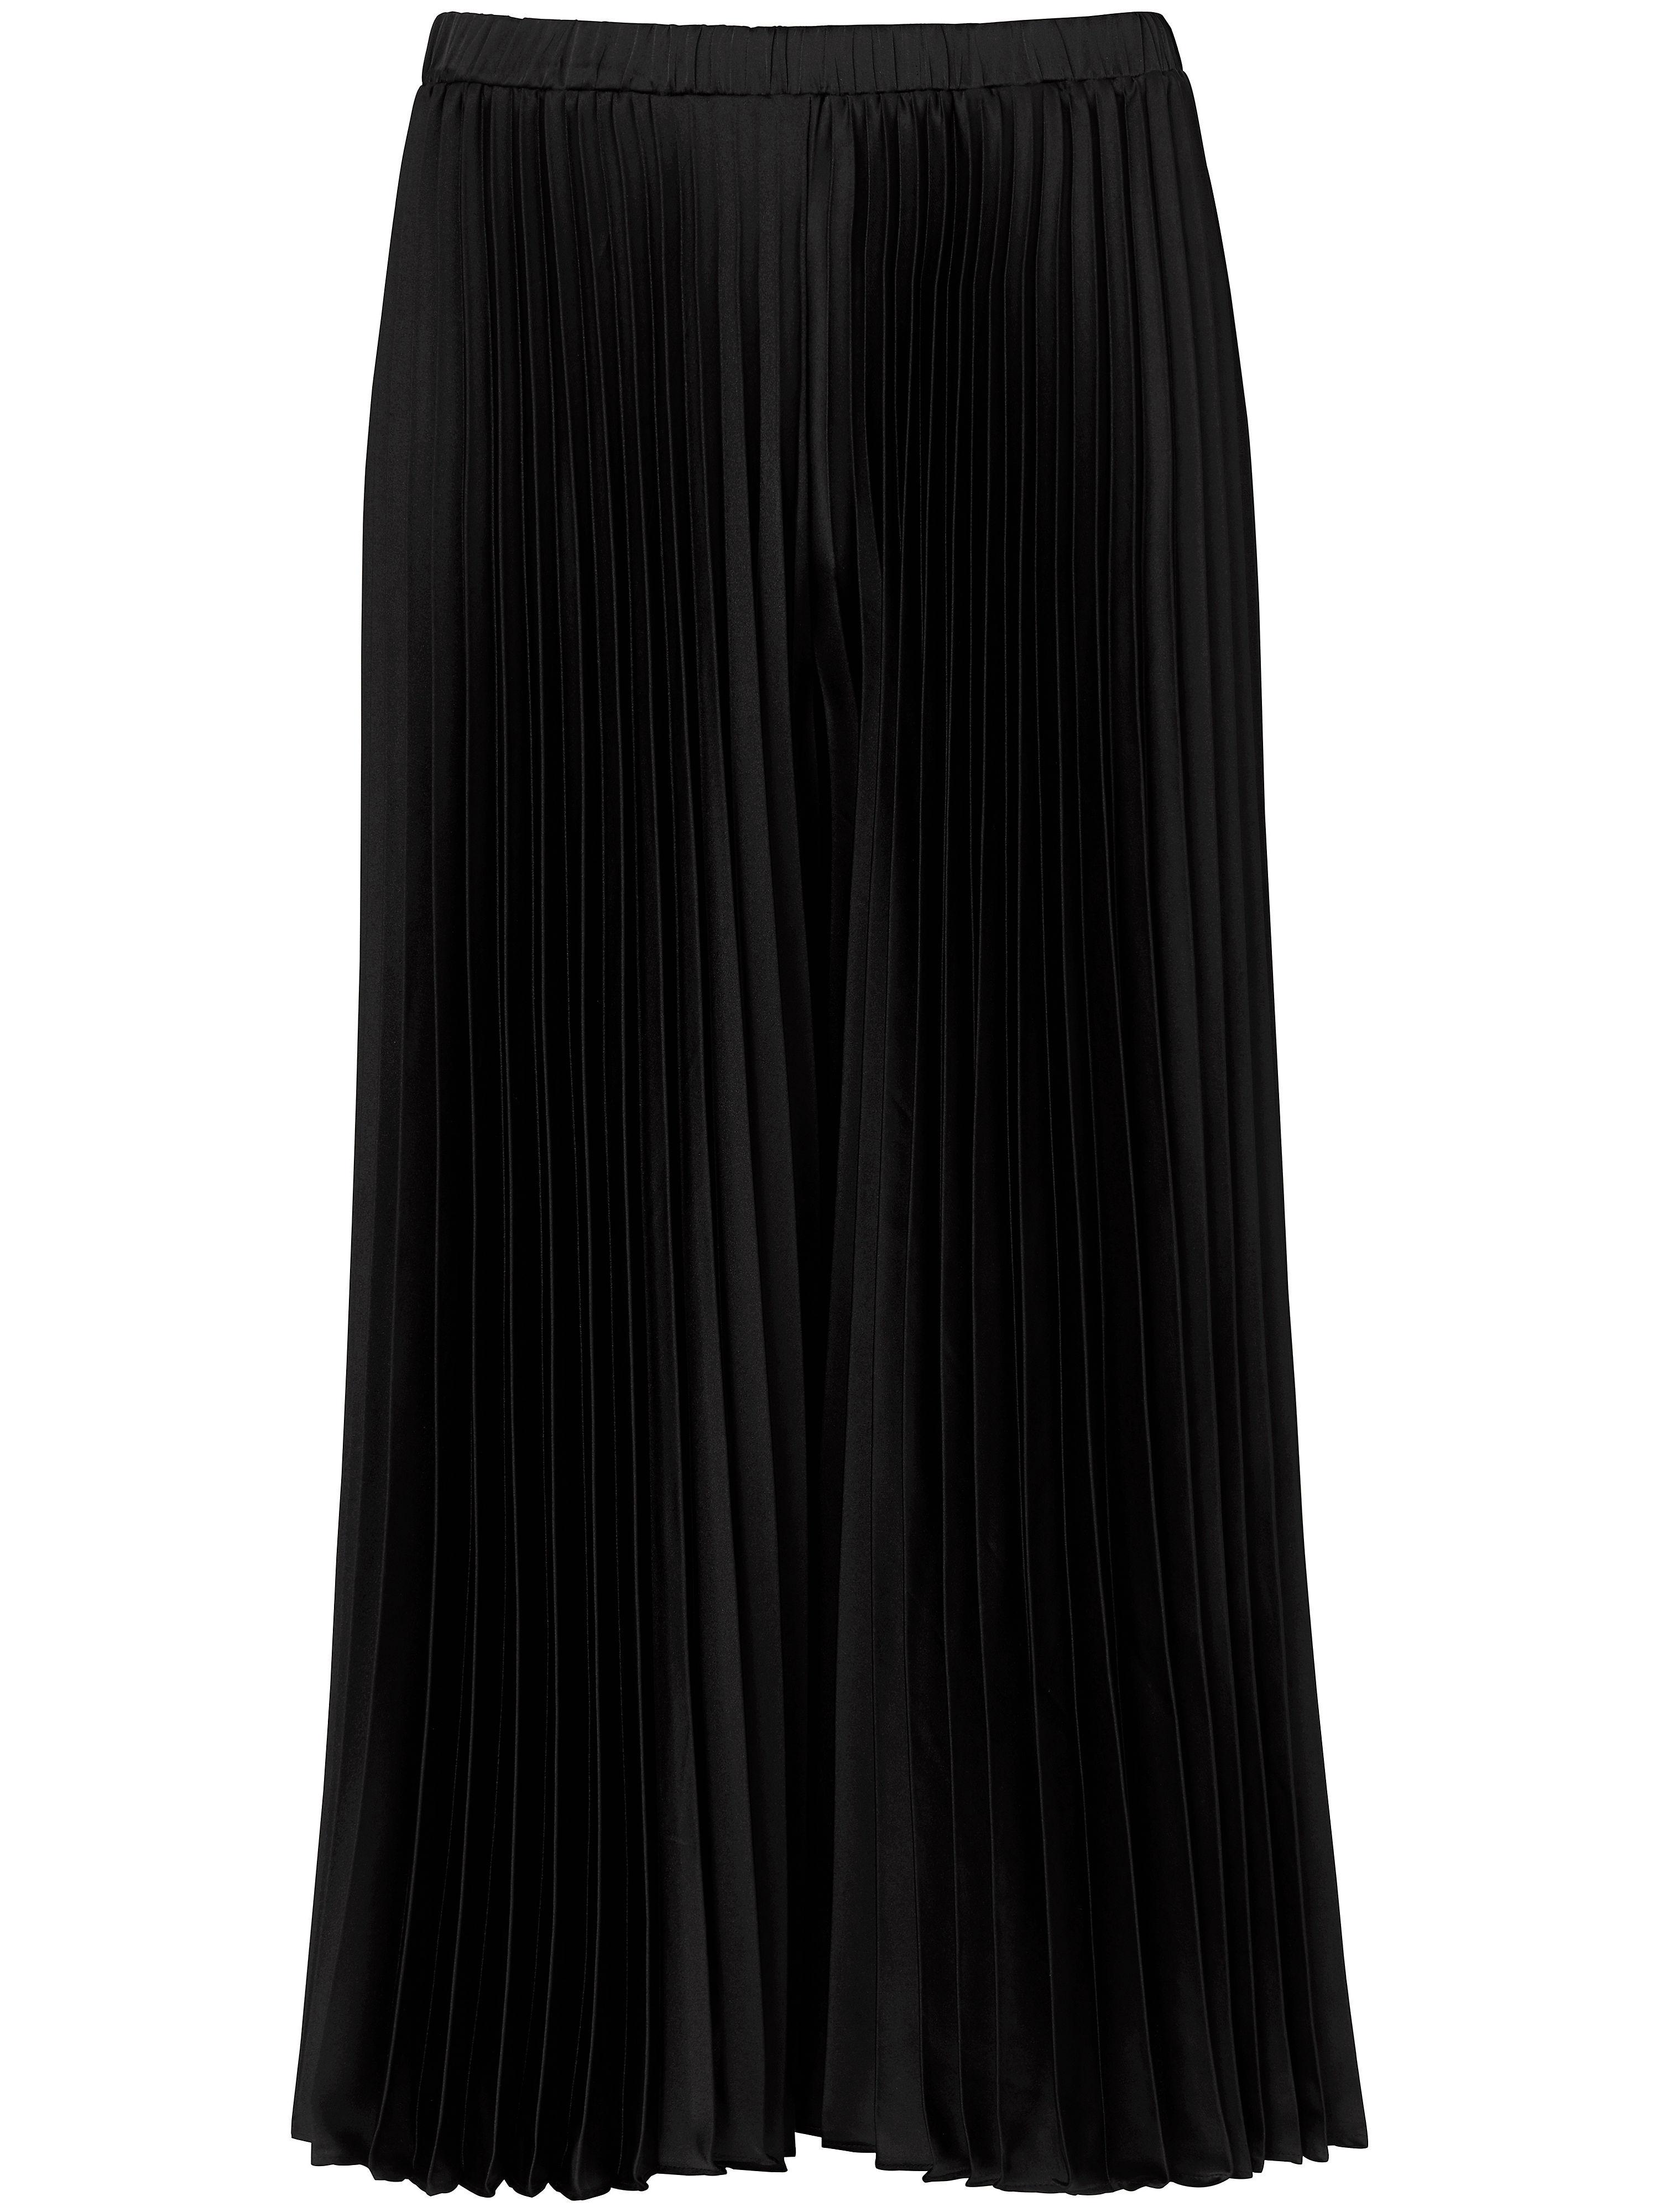 Hosenrock Plissee-Falten Uta Raasch schwarz | Bekleidung > Röcke > Hosenröcke | Uta Raasch